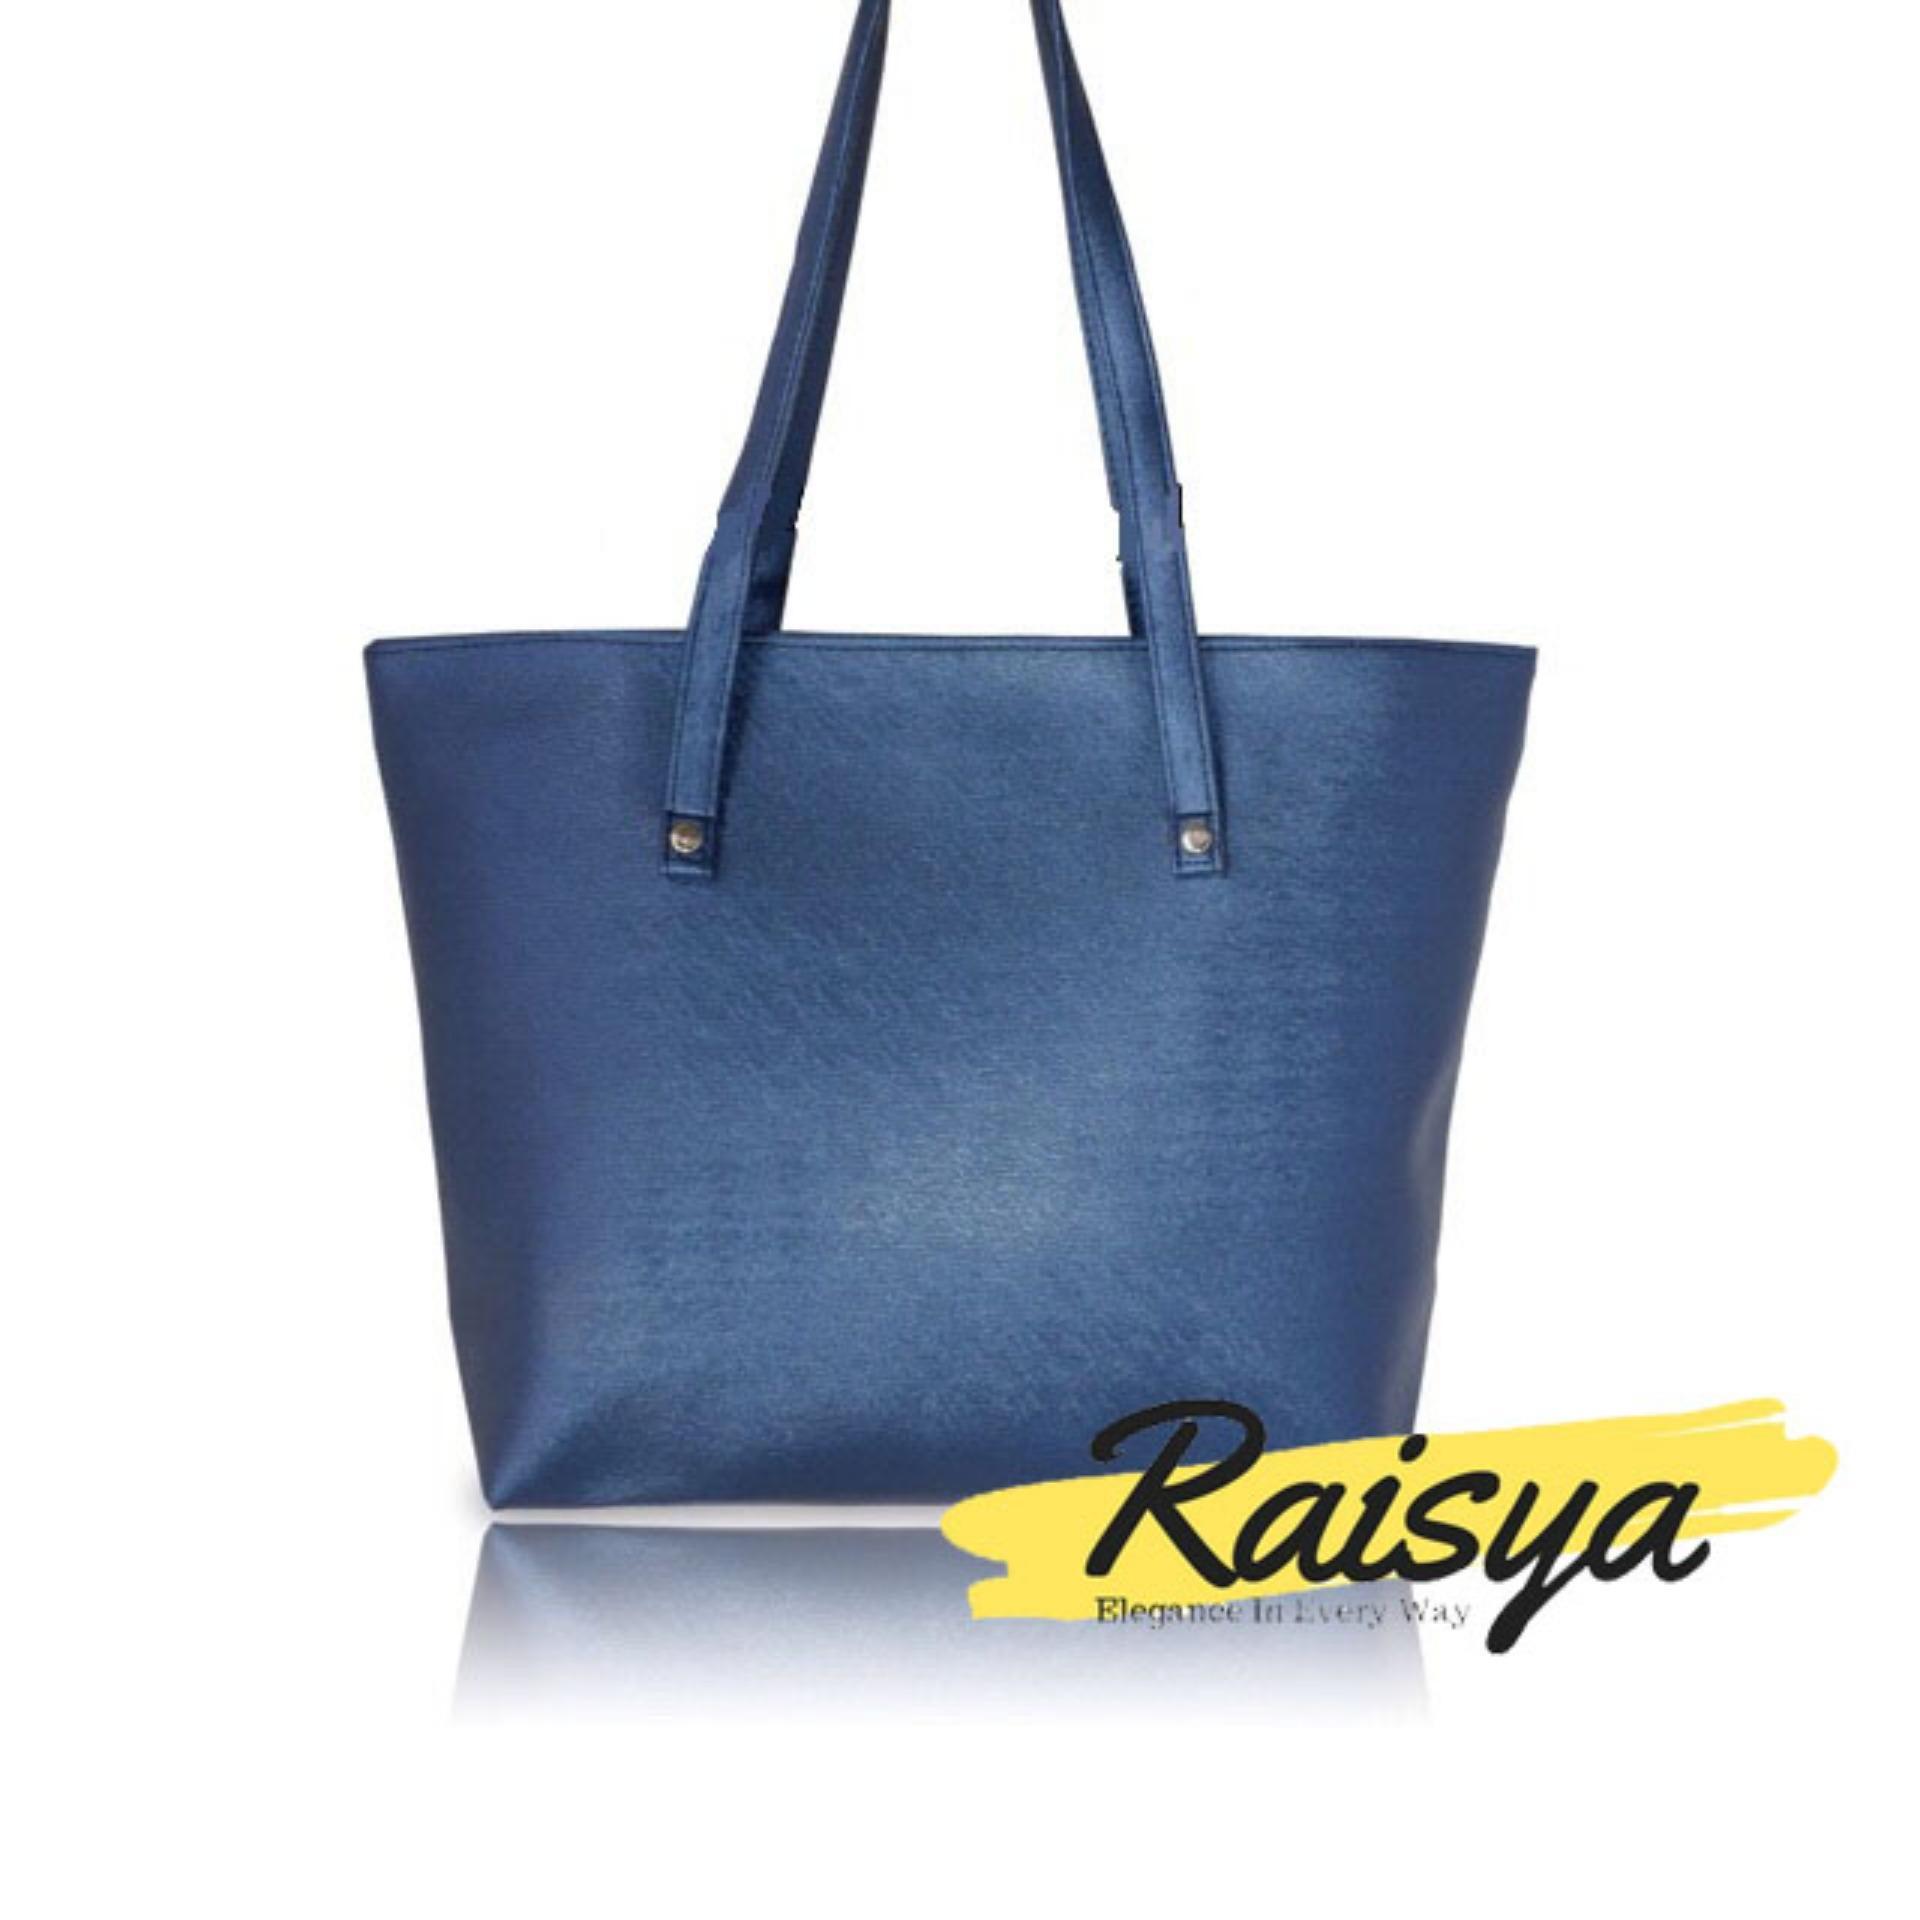 Raisya Tas Fashion New Tote Bag Kulit Polos - Navy